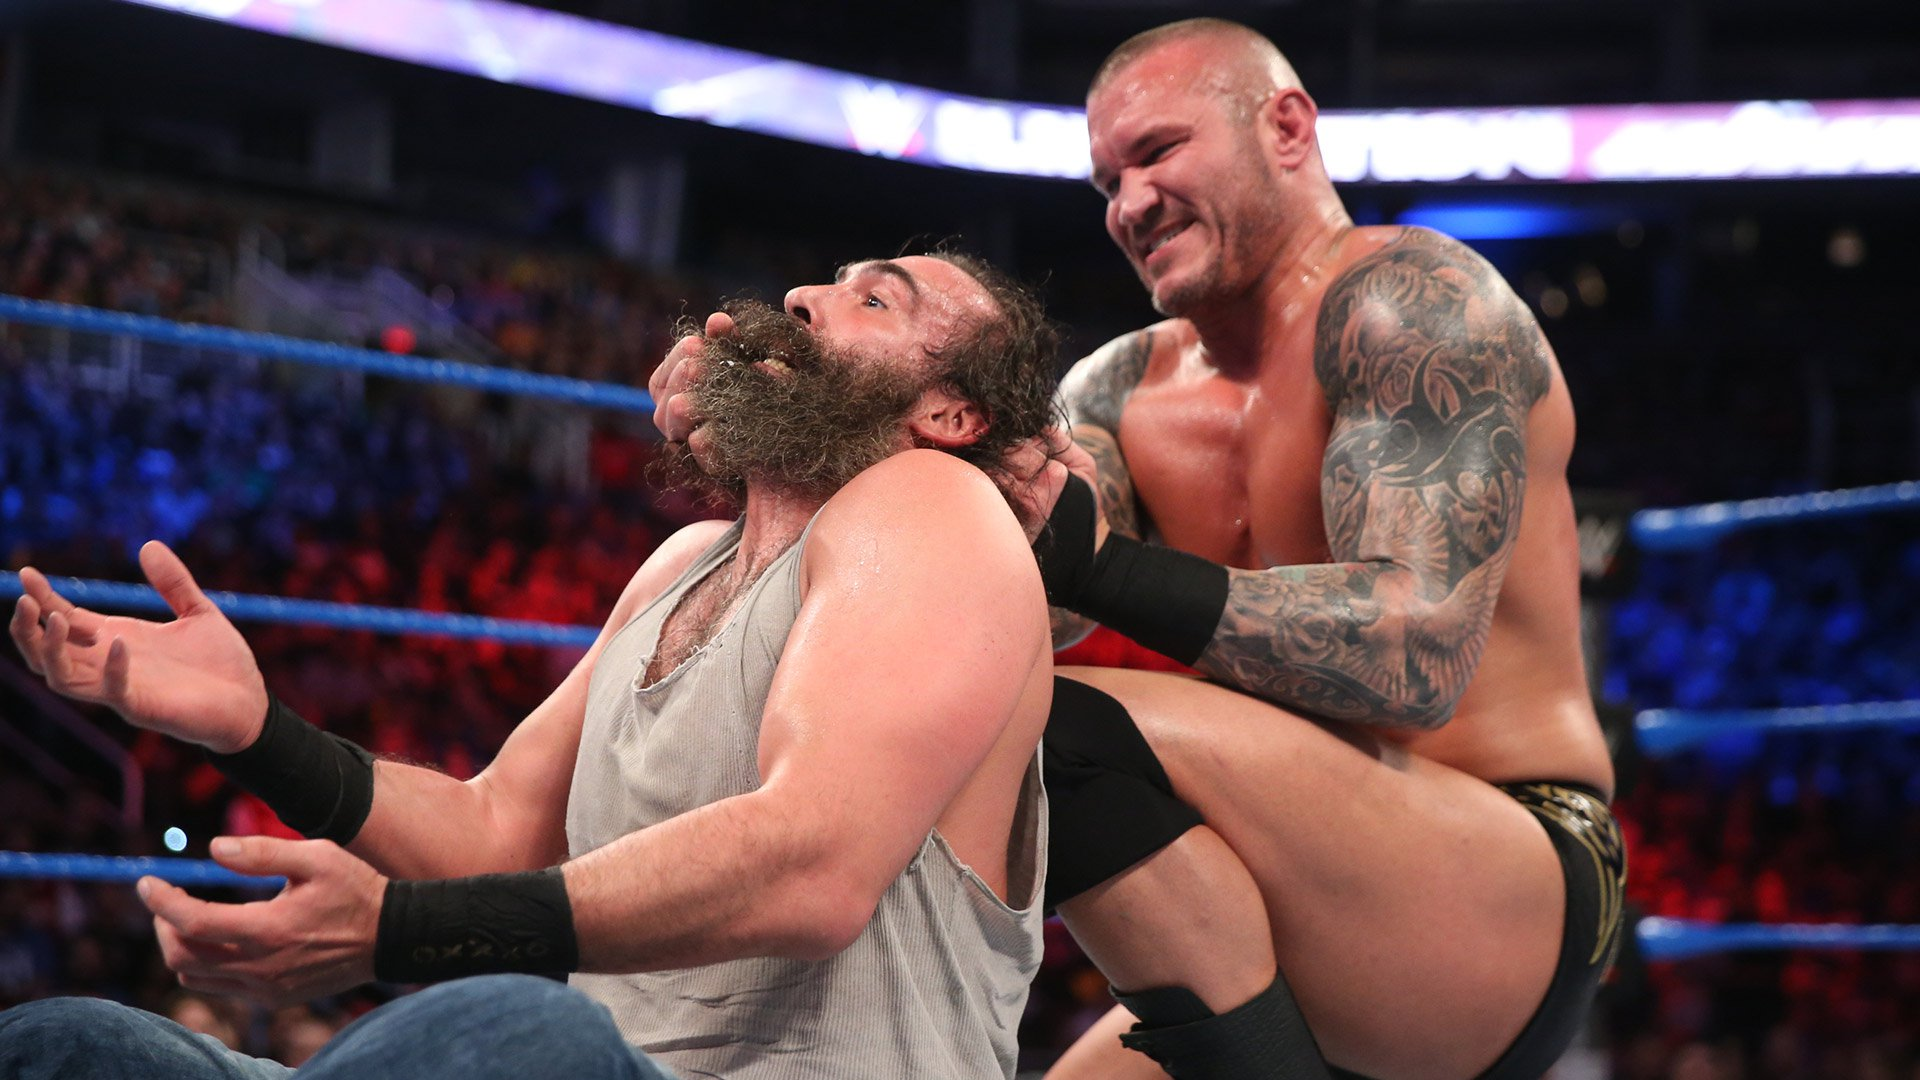 Luke Harper vs. Randy Orton: Elimination Chamber 2017 (WWE Network Exclusive)